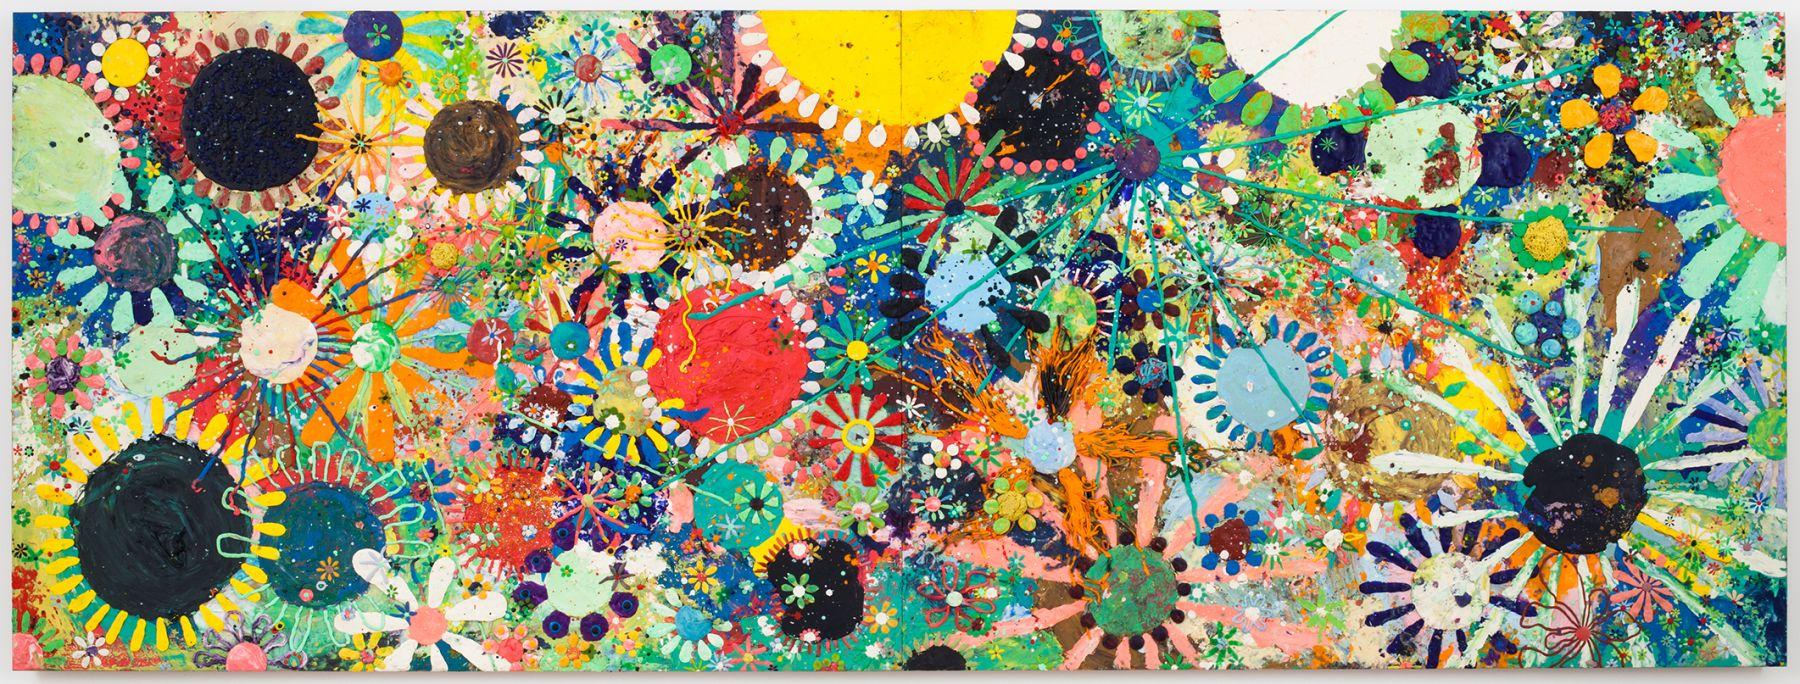 Gelitin, Untitled, 2011, Plasticine on wood panel, 40 5/8 x 109 1/2 x 4 1/4 inches